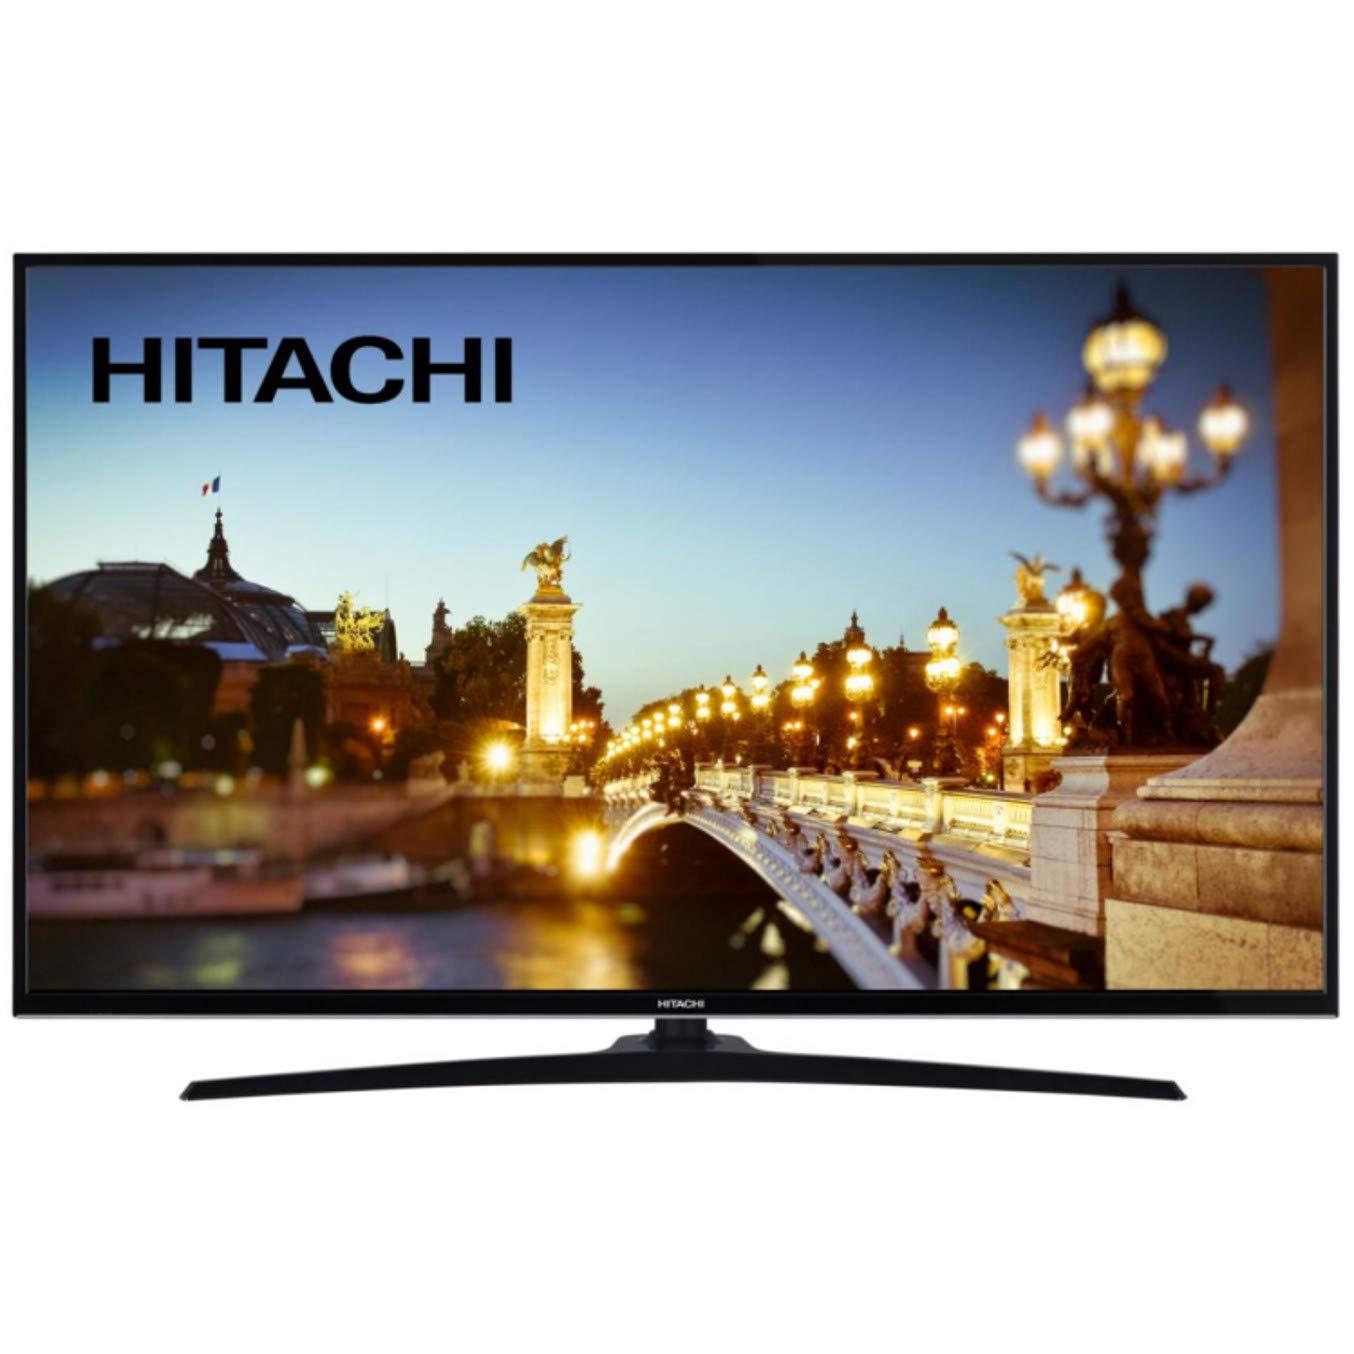 df1b55bd6e5a2 Hitachi 32he2000 Televisor 32   LCD Direct LED HD Ready 400hz Smart TV  WiFi  Amazon.fr  High-tech